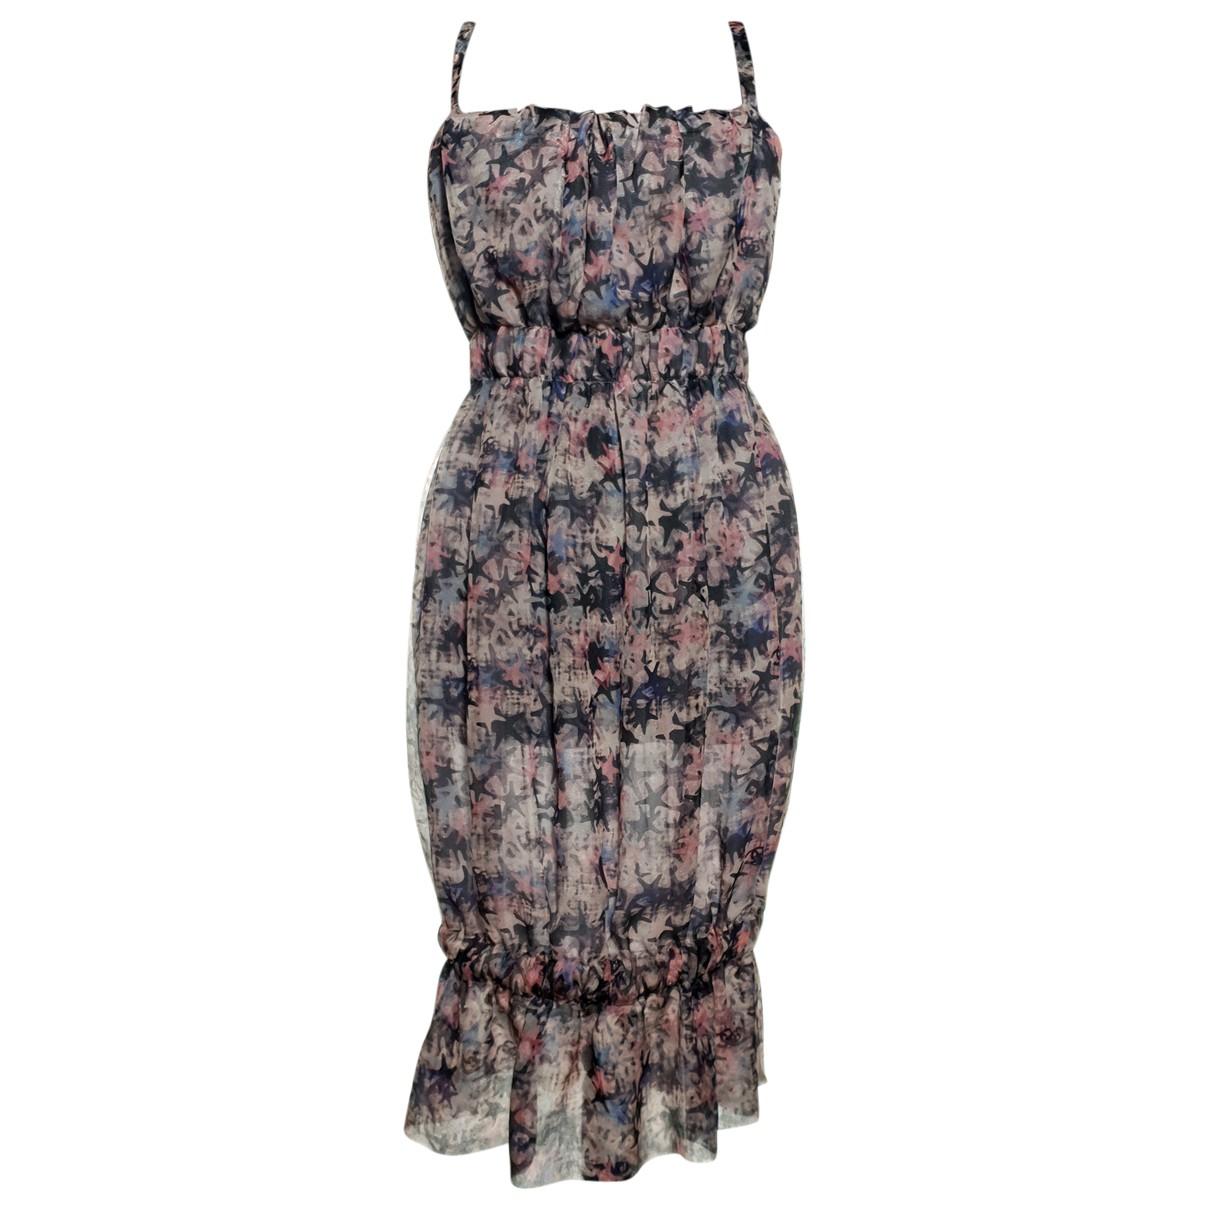 Chanel \N Silk dress for Women 36 FR